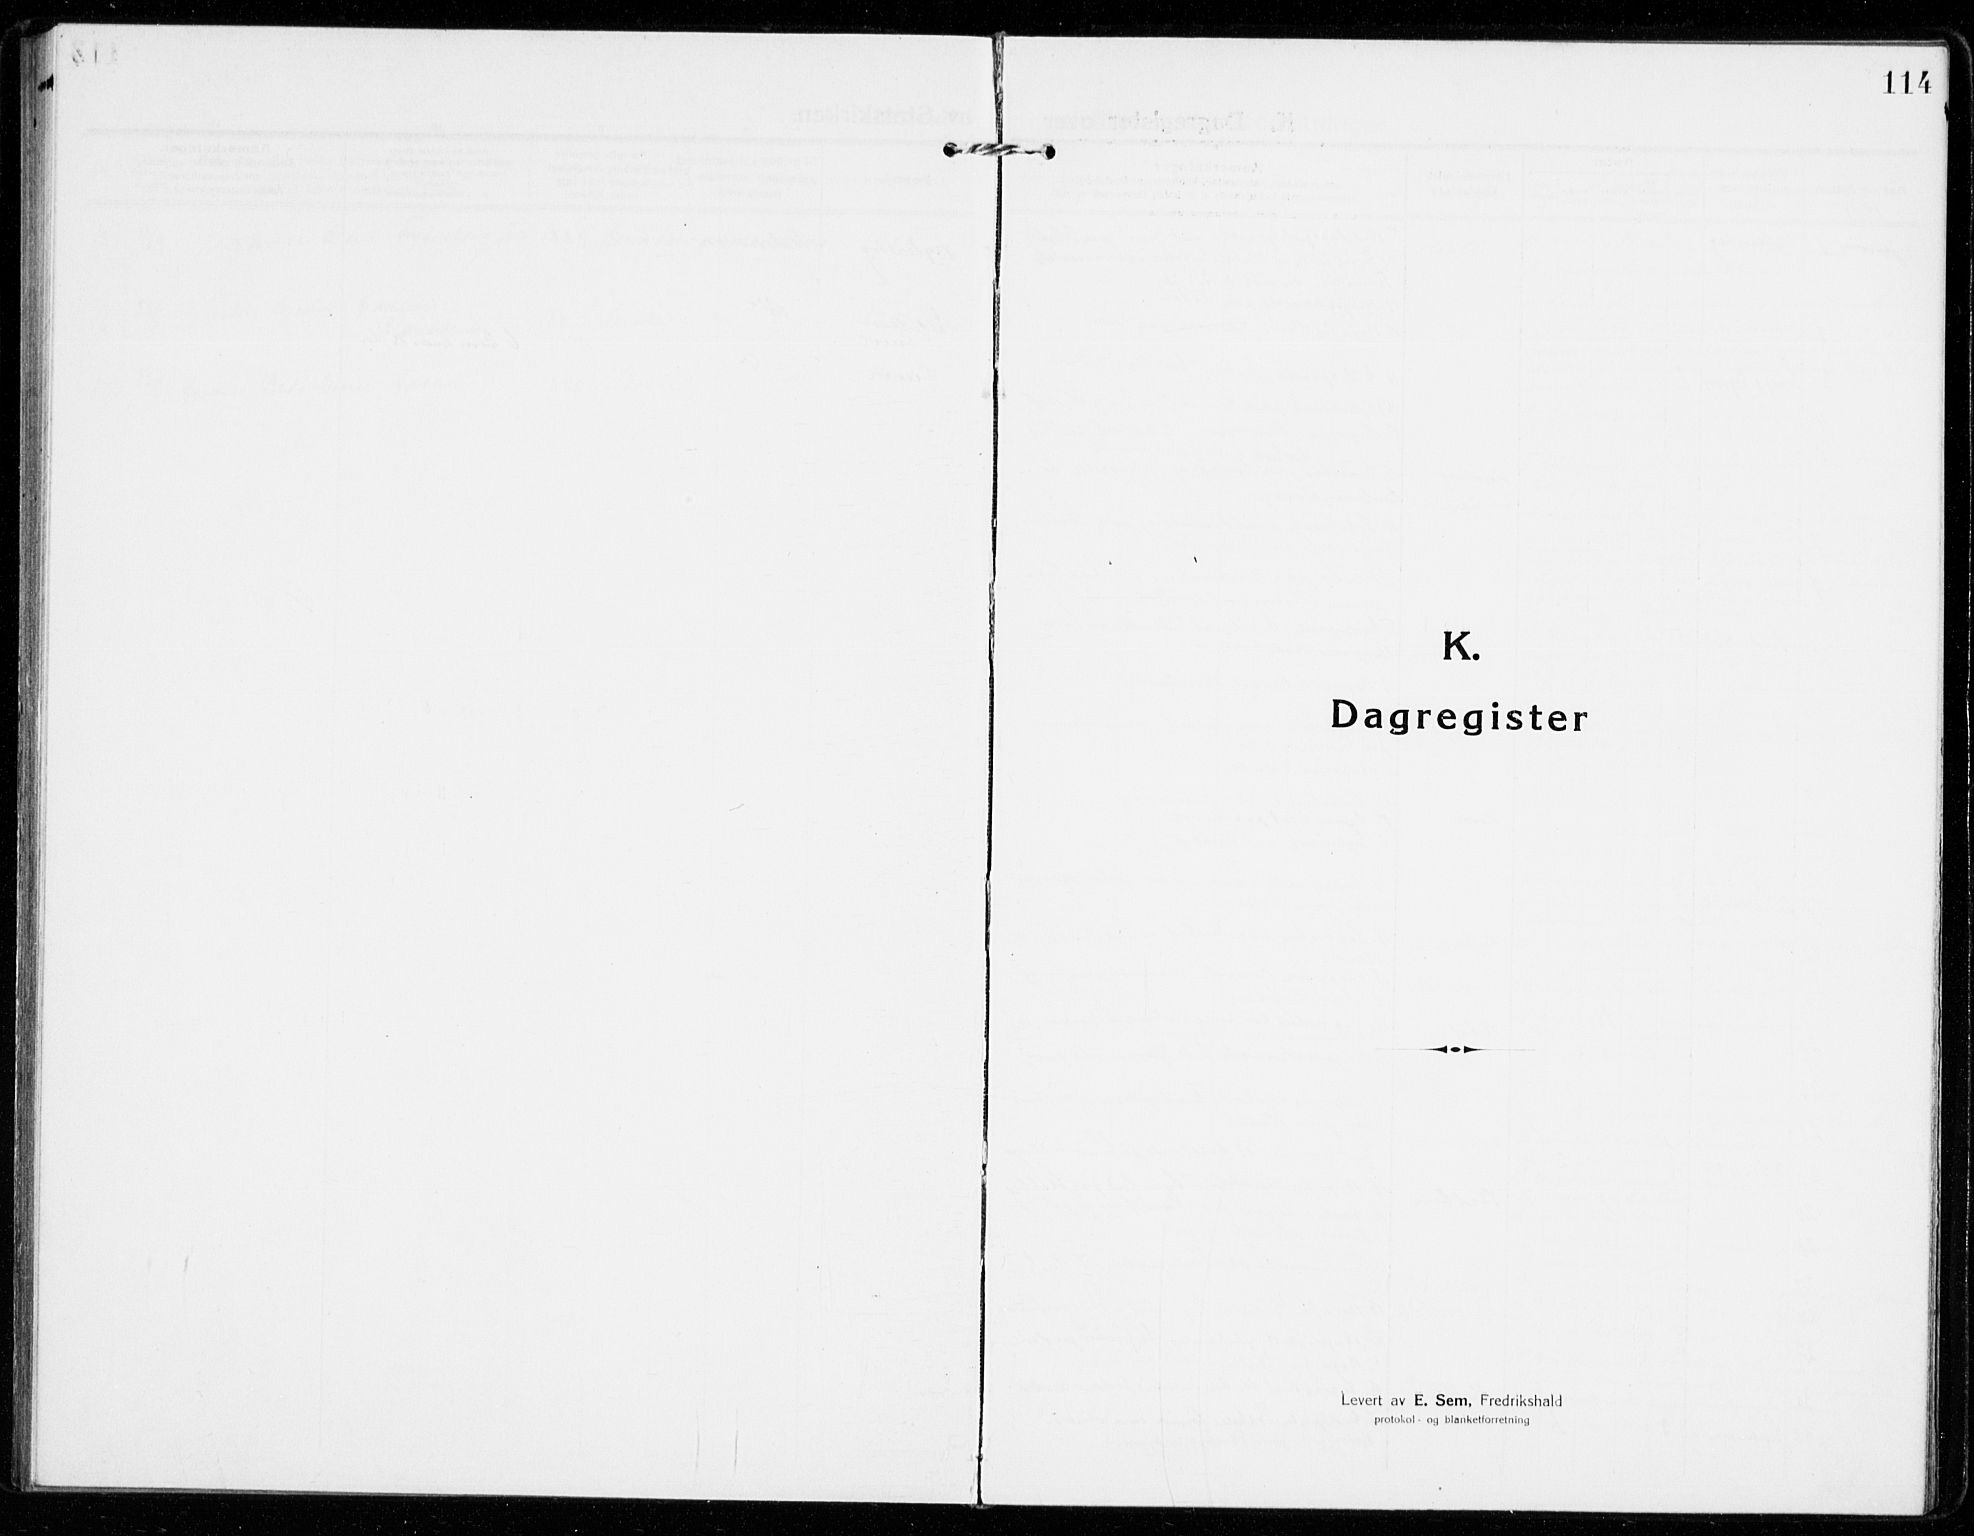 SAKO, Sandar kirkebøker, F/Fa/L0020: Parish register (official) no. 20, 1915-1919, p. 114